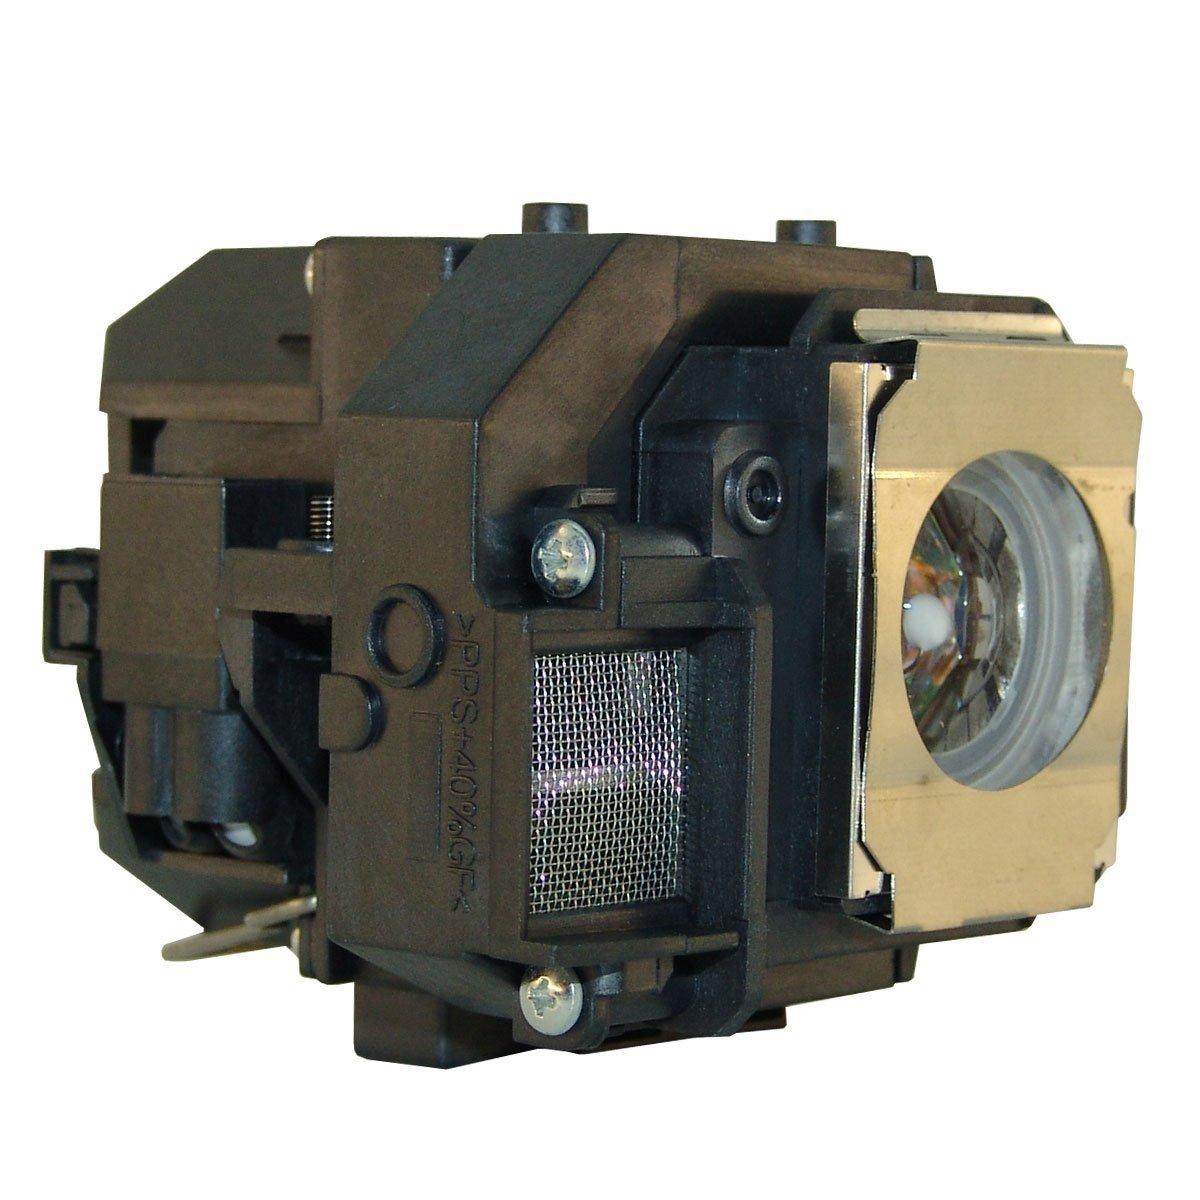 ELPLP58 V13H010L58 Lamp for Epson EX7200 EB-X10 EB-X9 EB-X92 EB-S9 EB-S92 EB-S10 EB-W9 EB-W10 Projector Bulb Lamp<br><br>Aliexpress